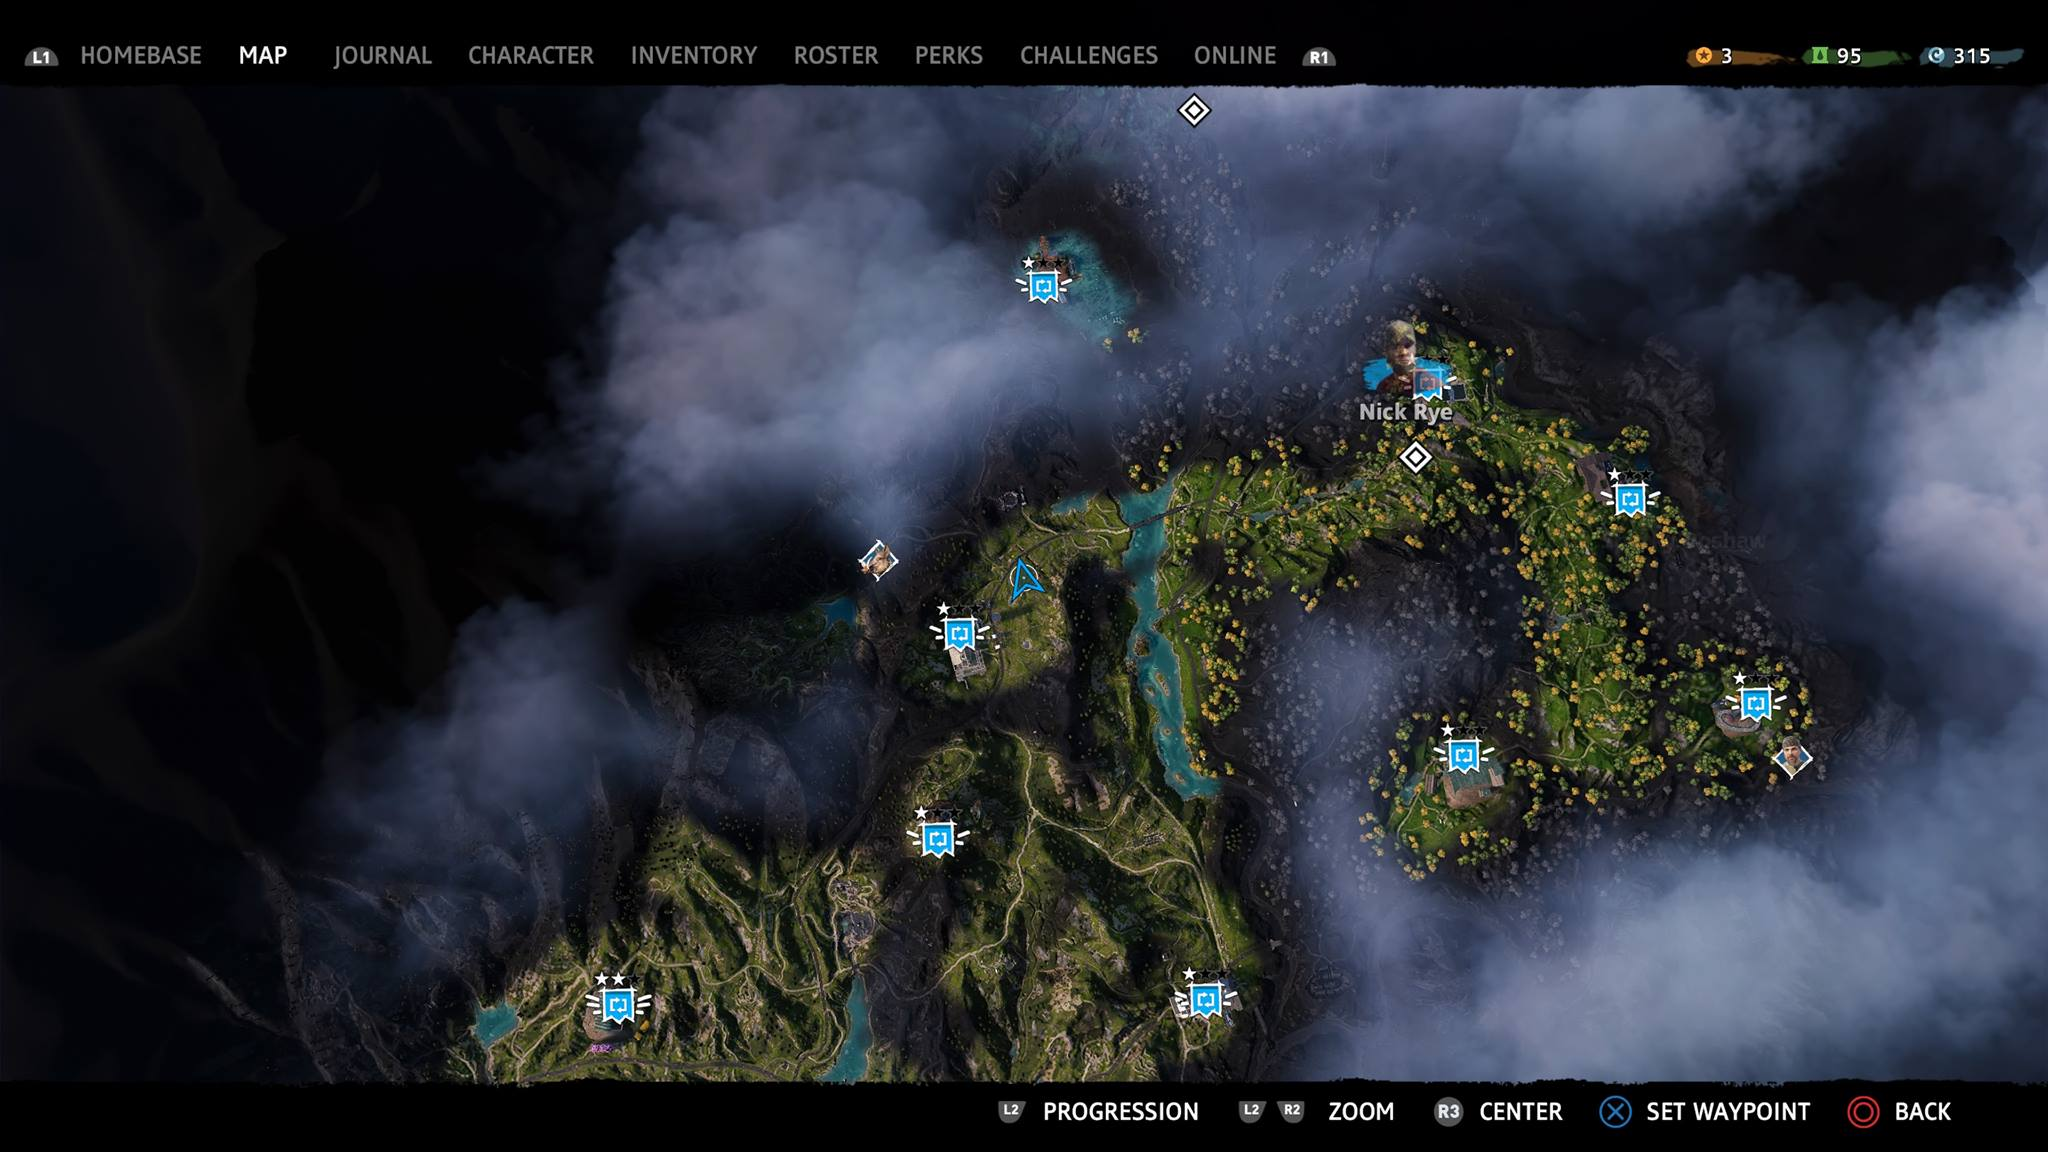 far cry new dawn map comparison